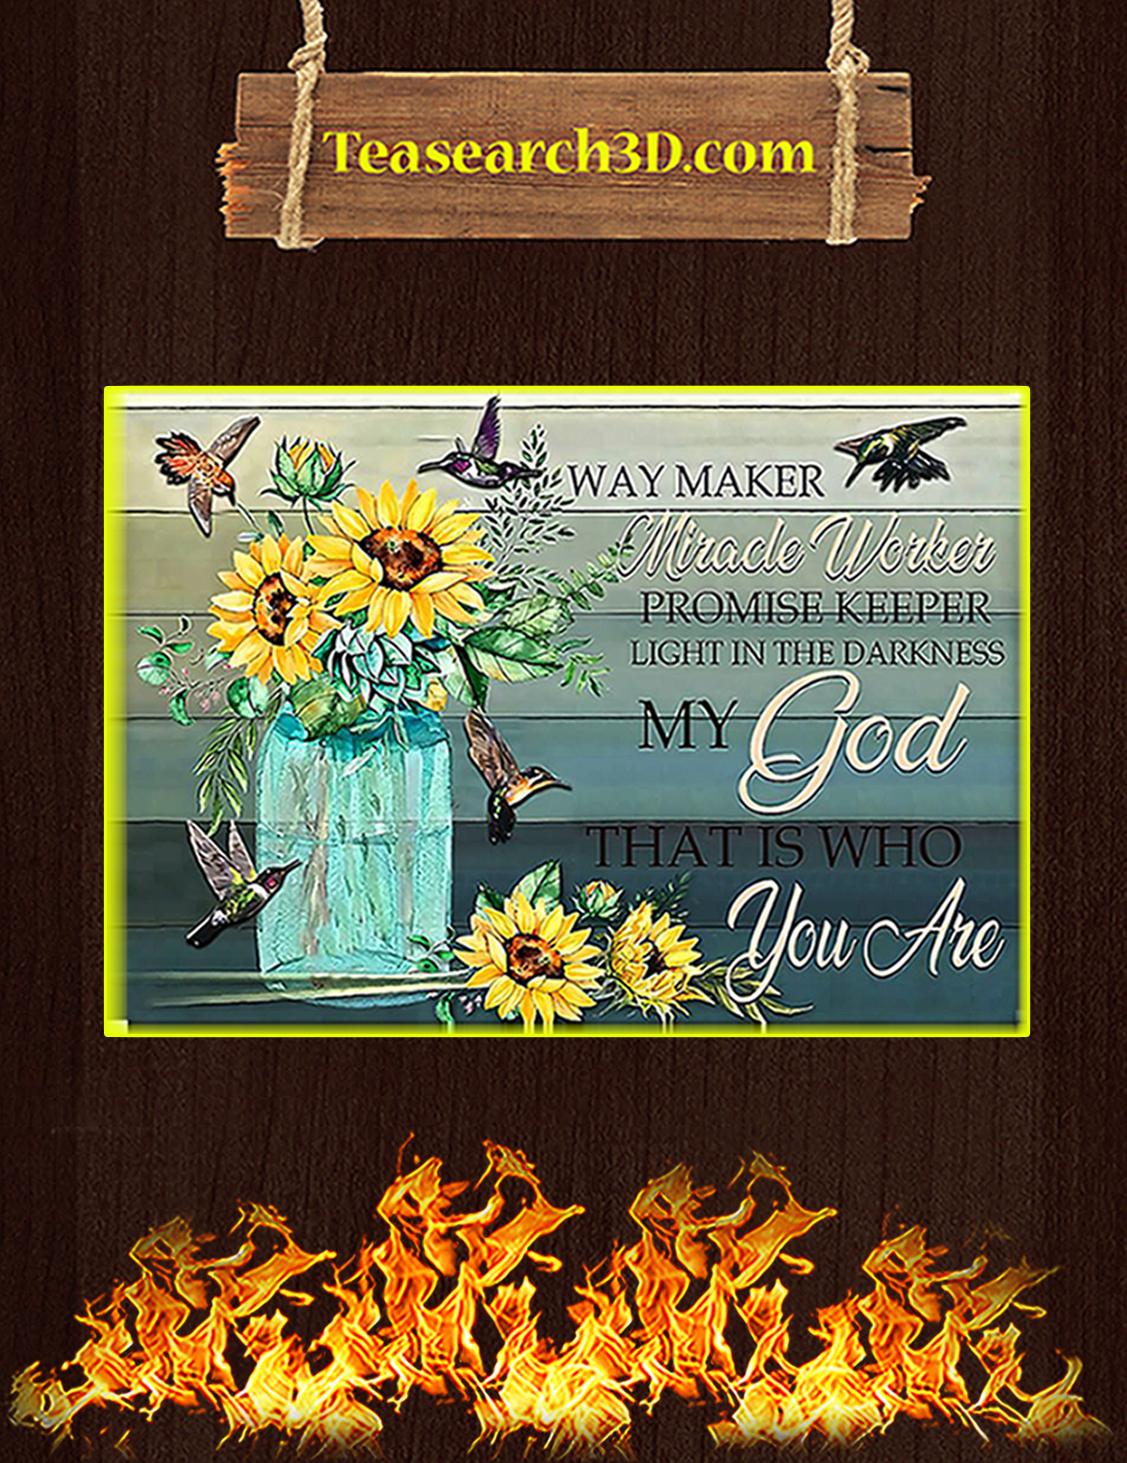 Hummingbird sunflower way maker miracle worker poster A3